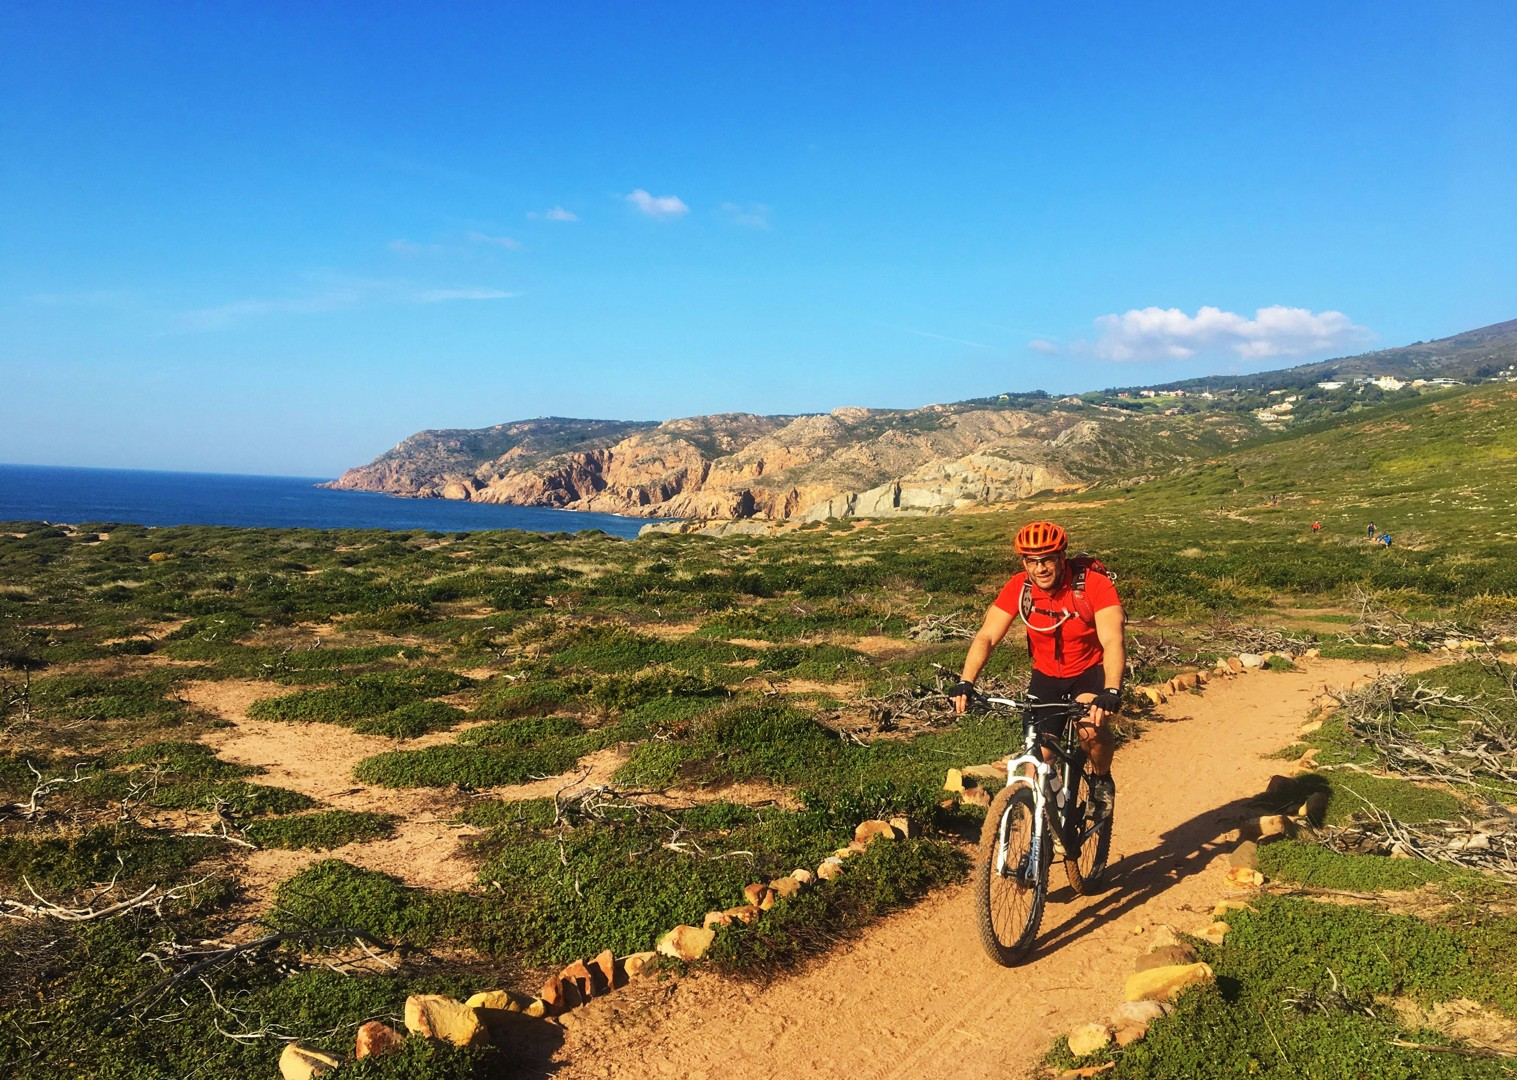 rural-tracks-cycling-holiday-on-atlantic-coast-portugal.jpg - Portugal - Atlantic Trails - Mountain Biking